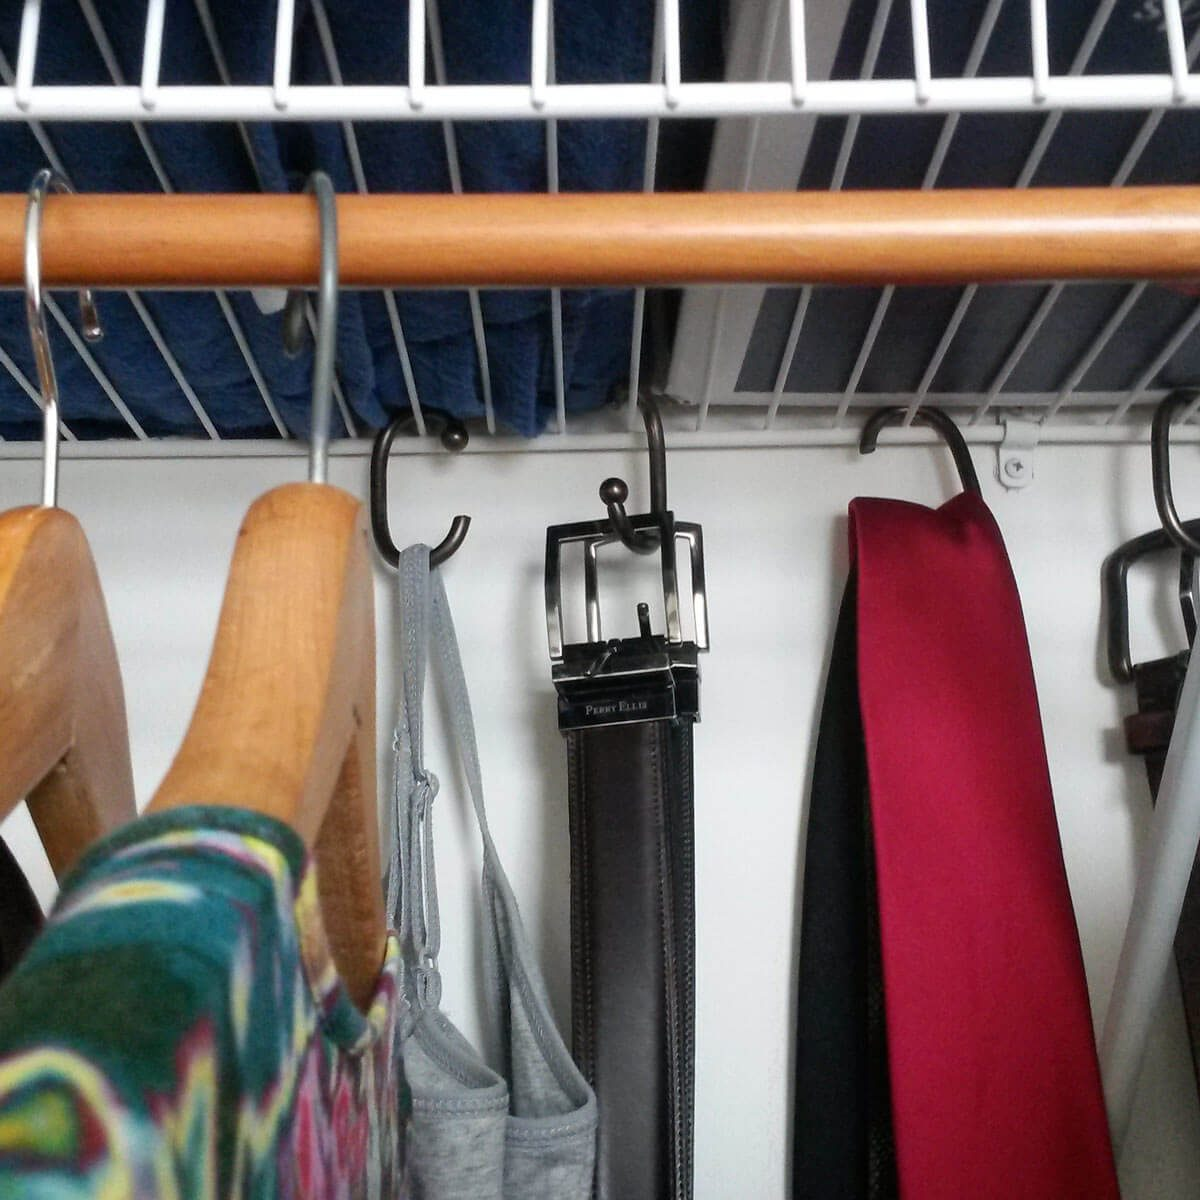 closet ideas bedroom coverimage organization and hacks ad top